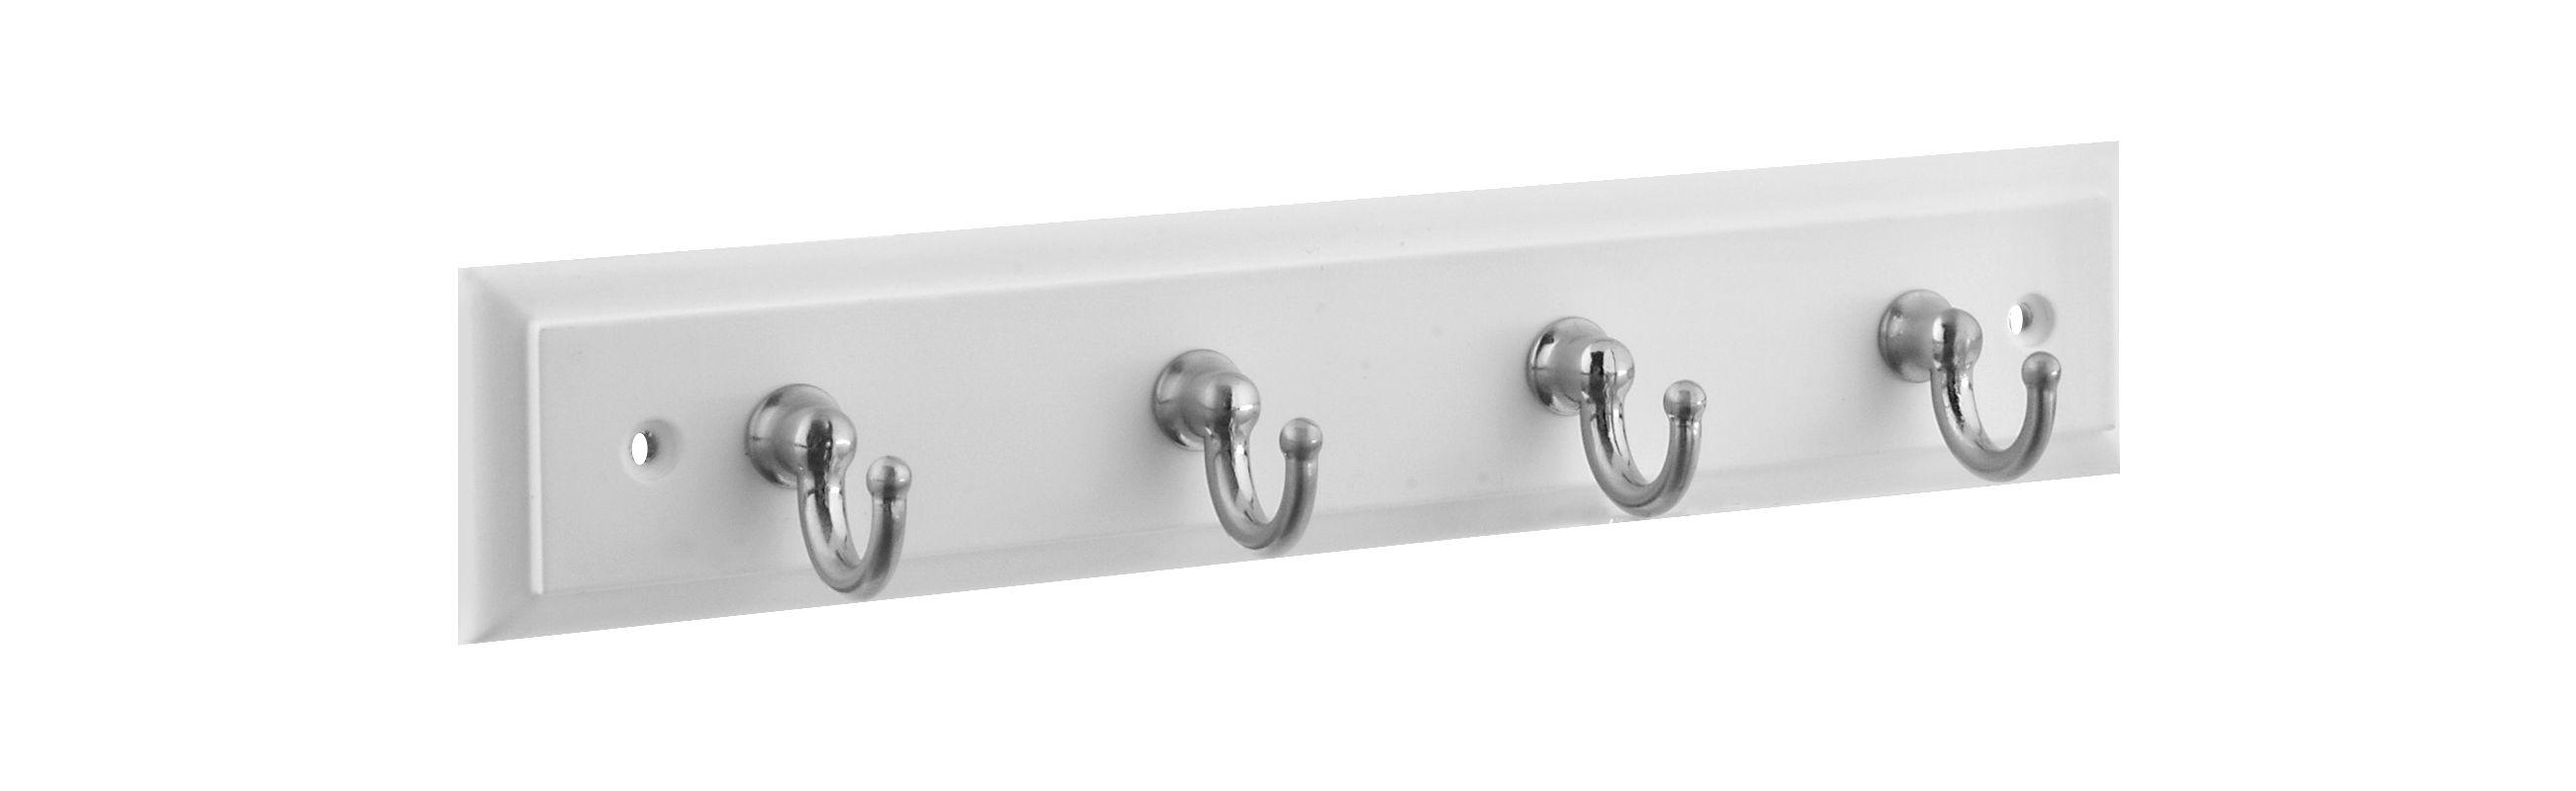 stanley home designs b8175sn satin nickel on white inch long x 1